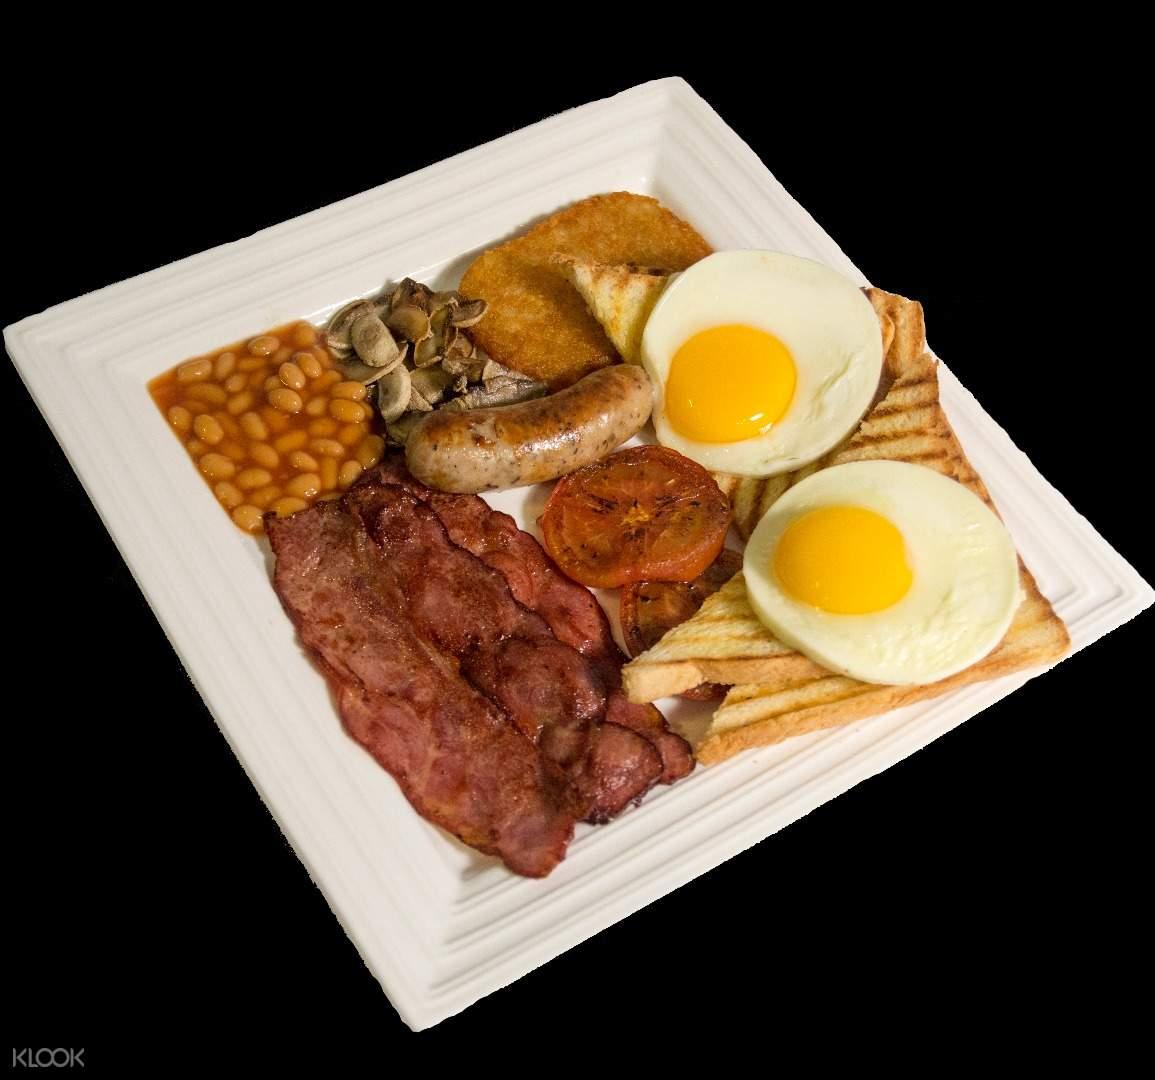 Breakfast at Lax Café